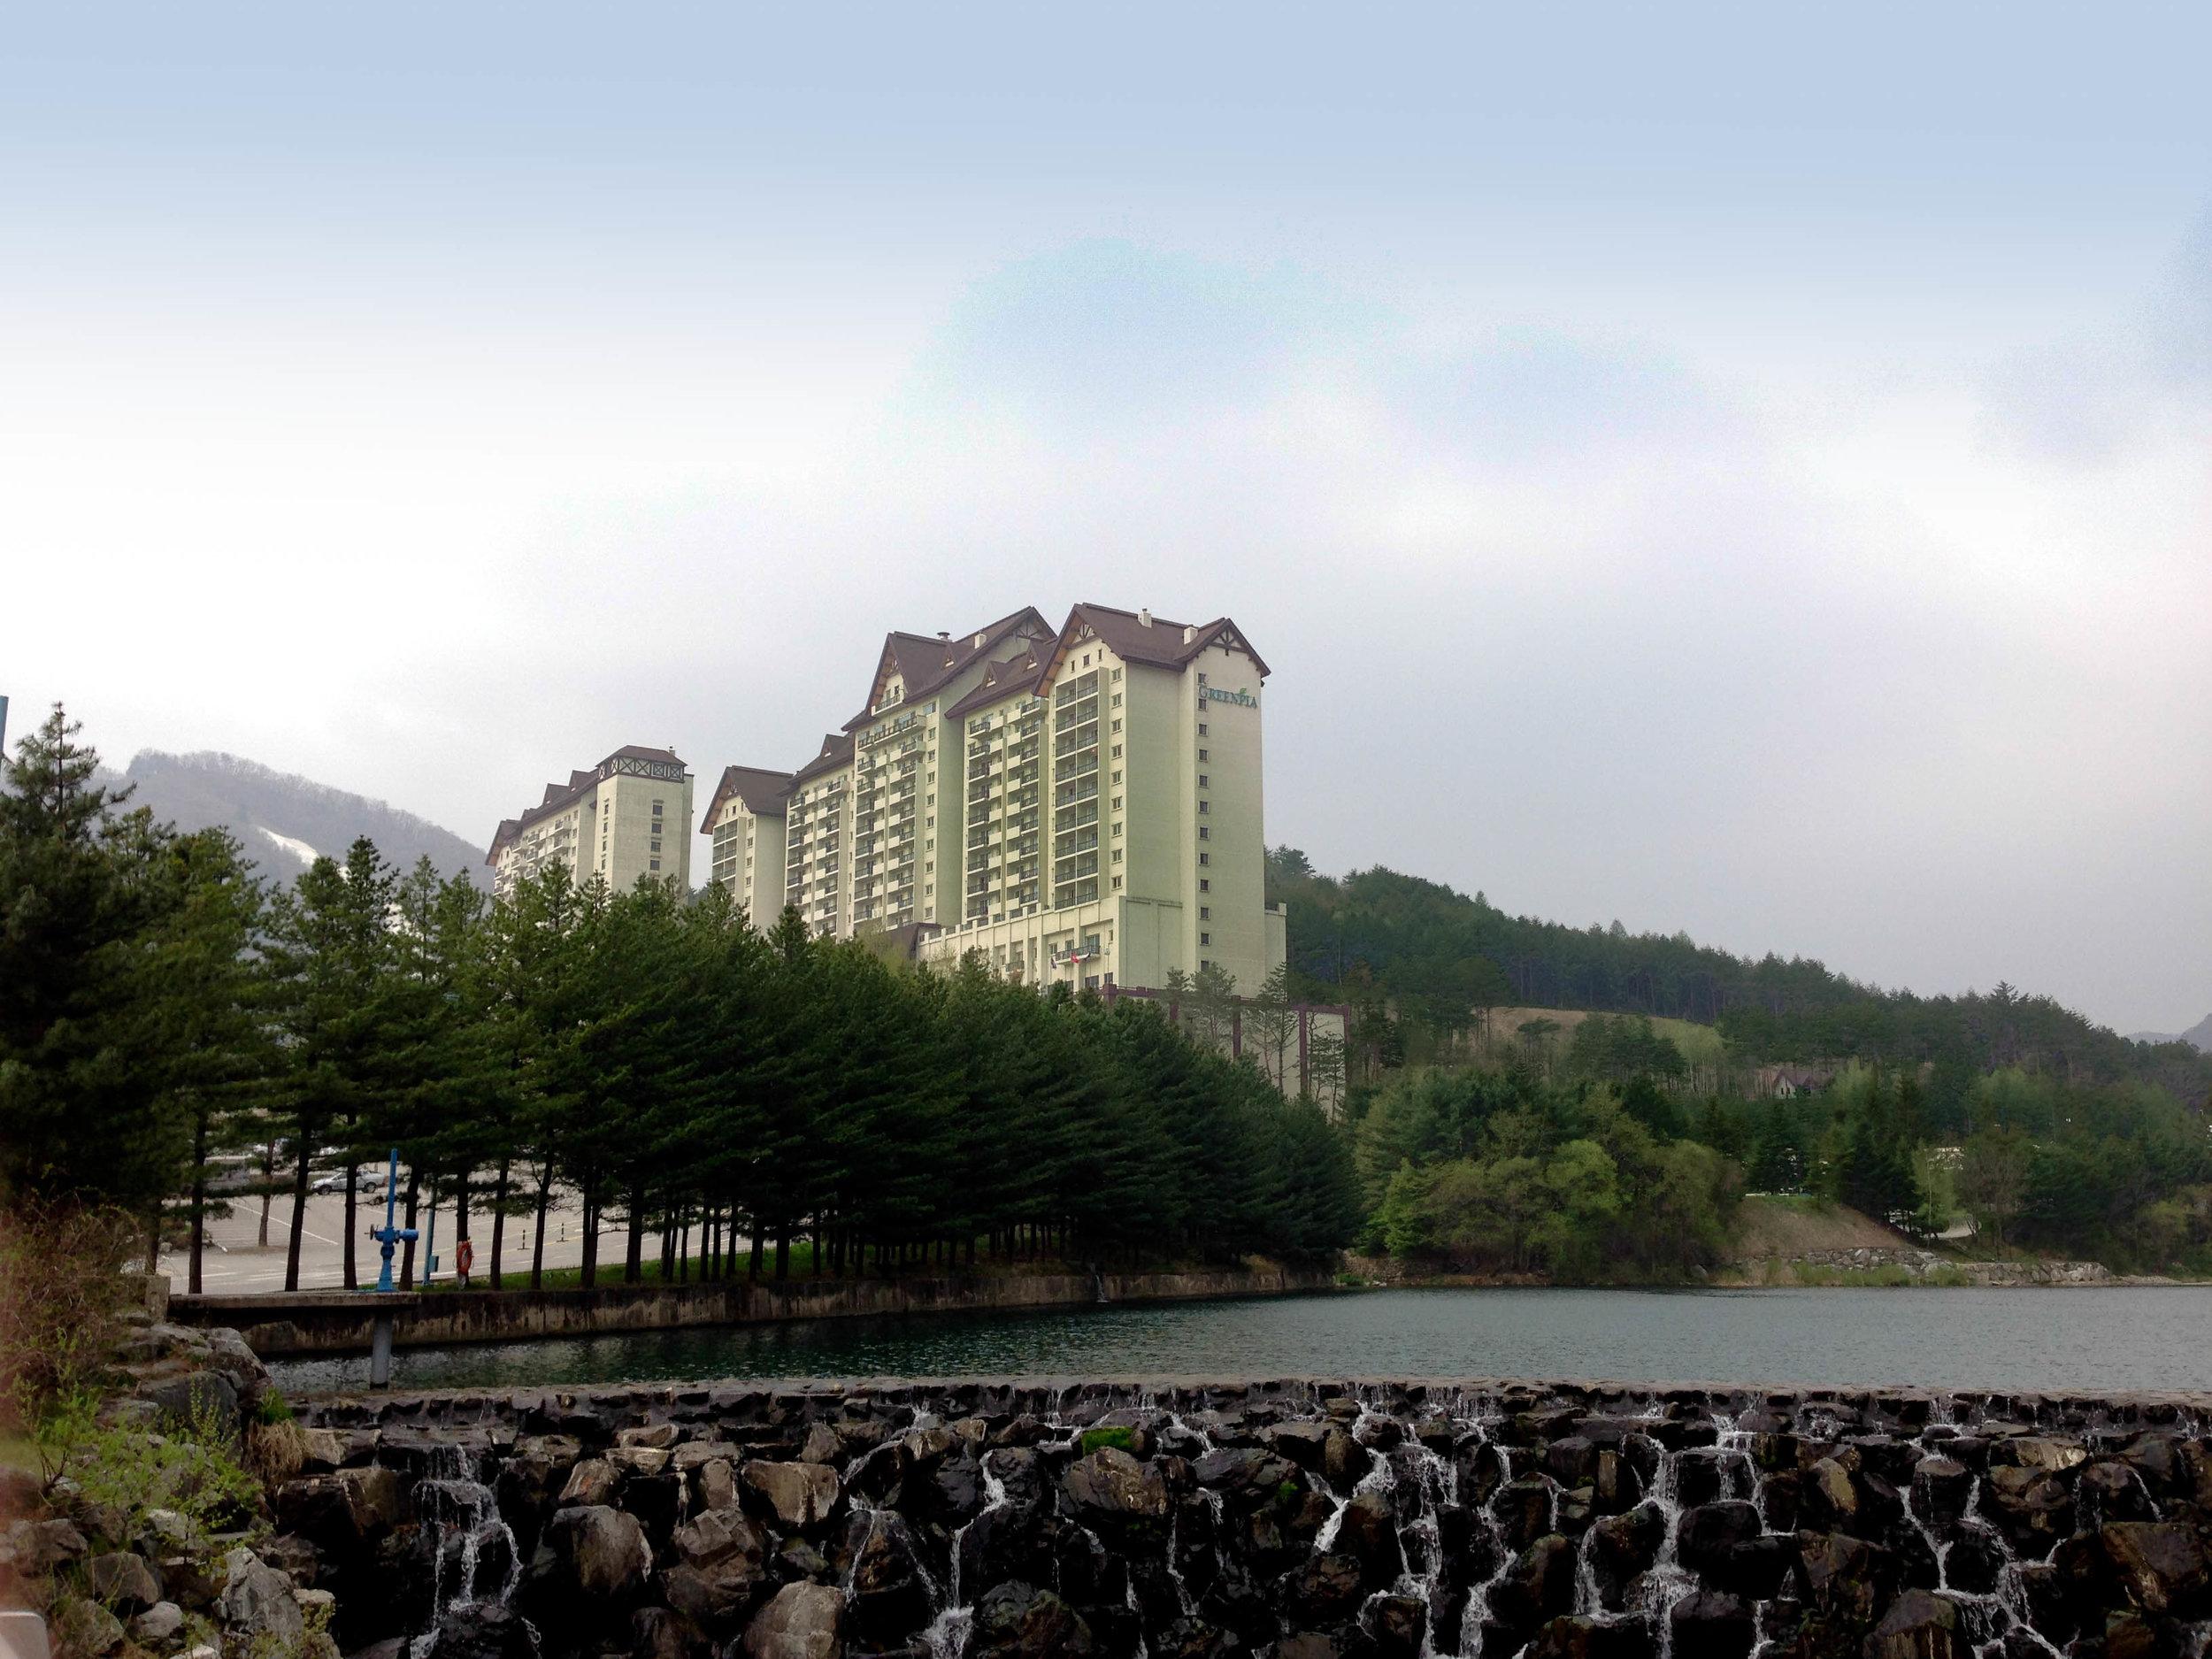 Greenpia Resort at YongPyong in PeyongChang